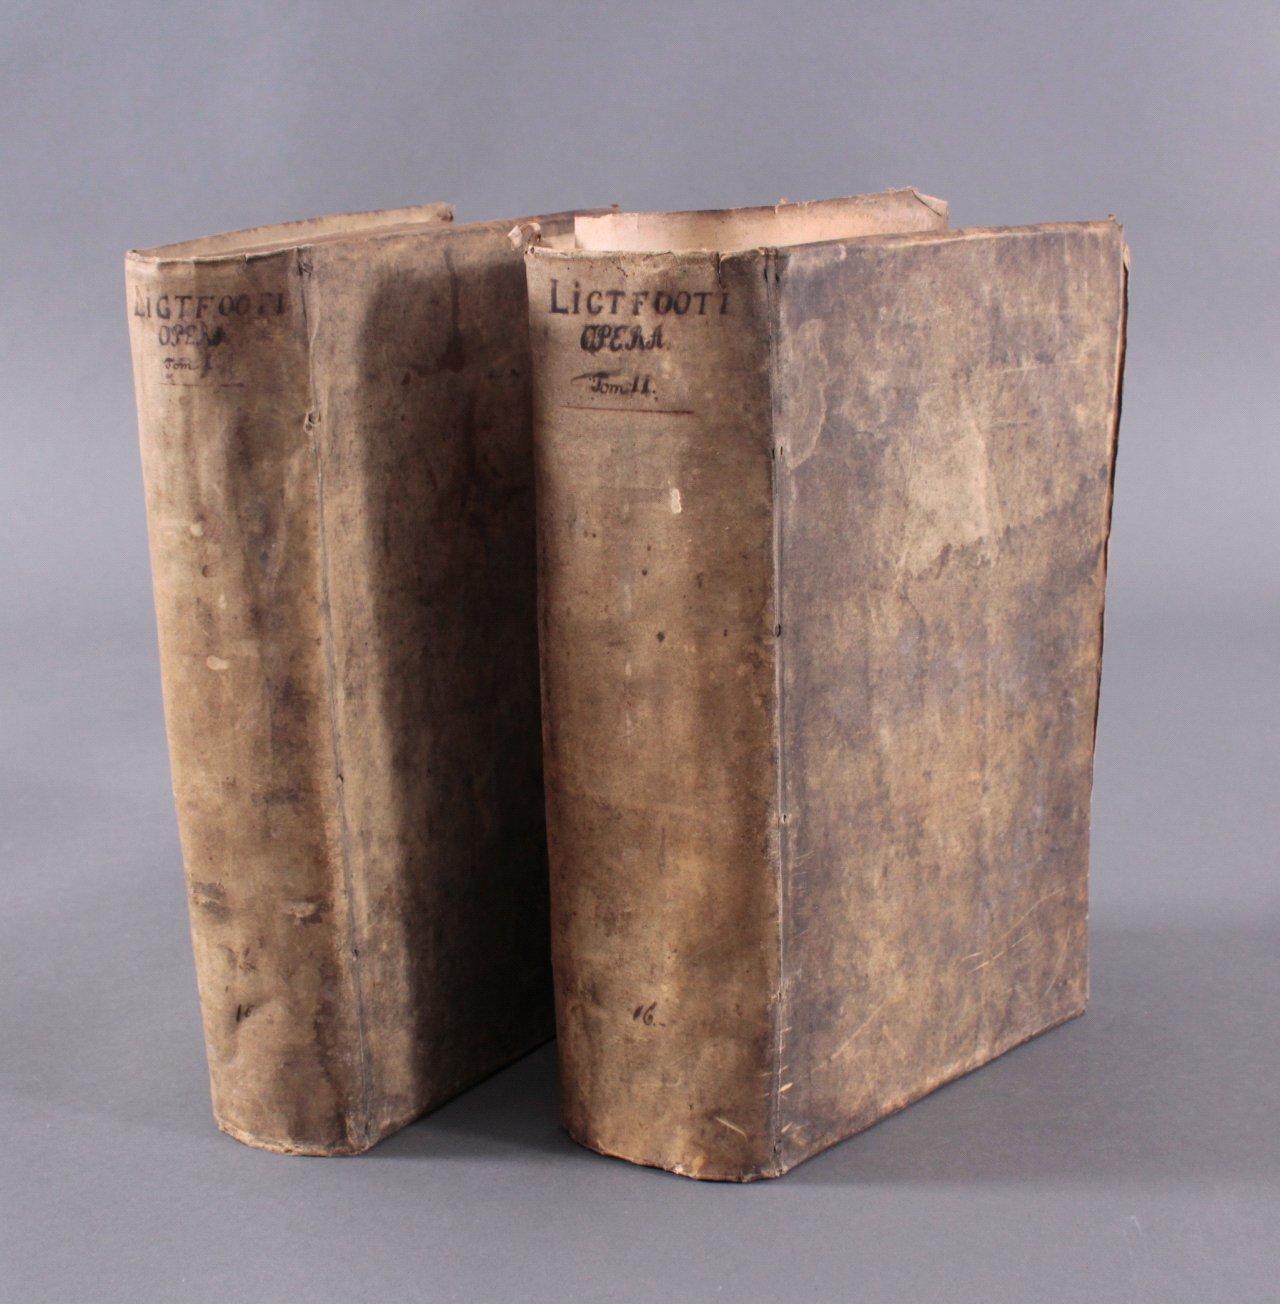 2 Ausgaben Joannis Lightfooti, 1618